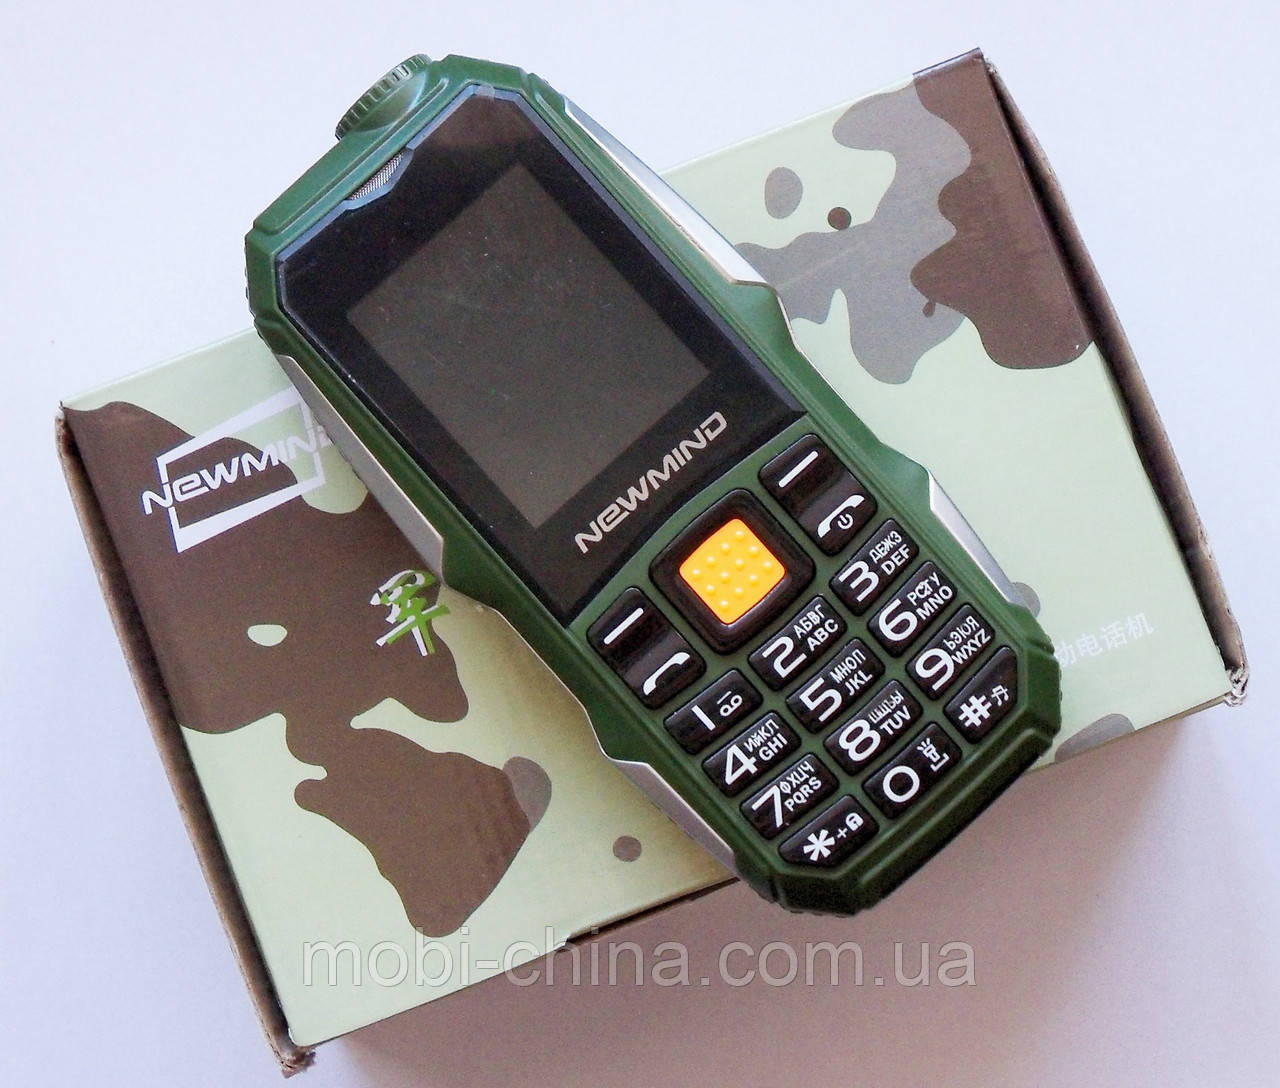 Противоударный LAND ROVER Newmind F6000 - 2 Sim  2600 mAh  green